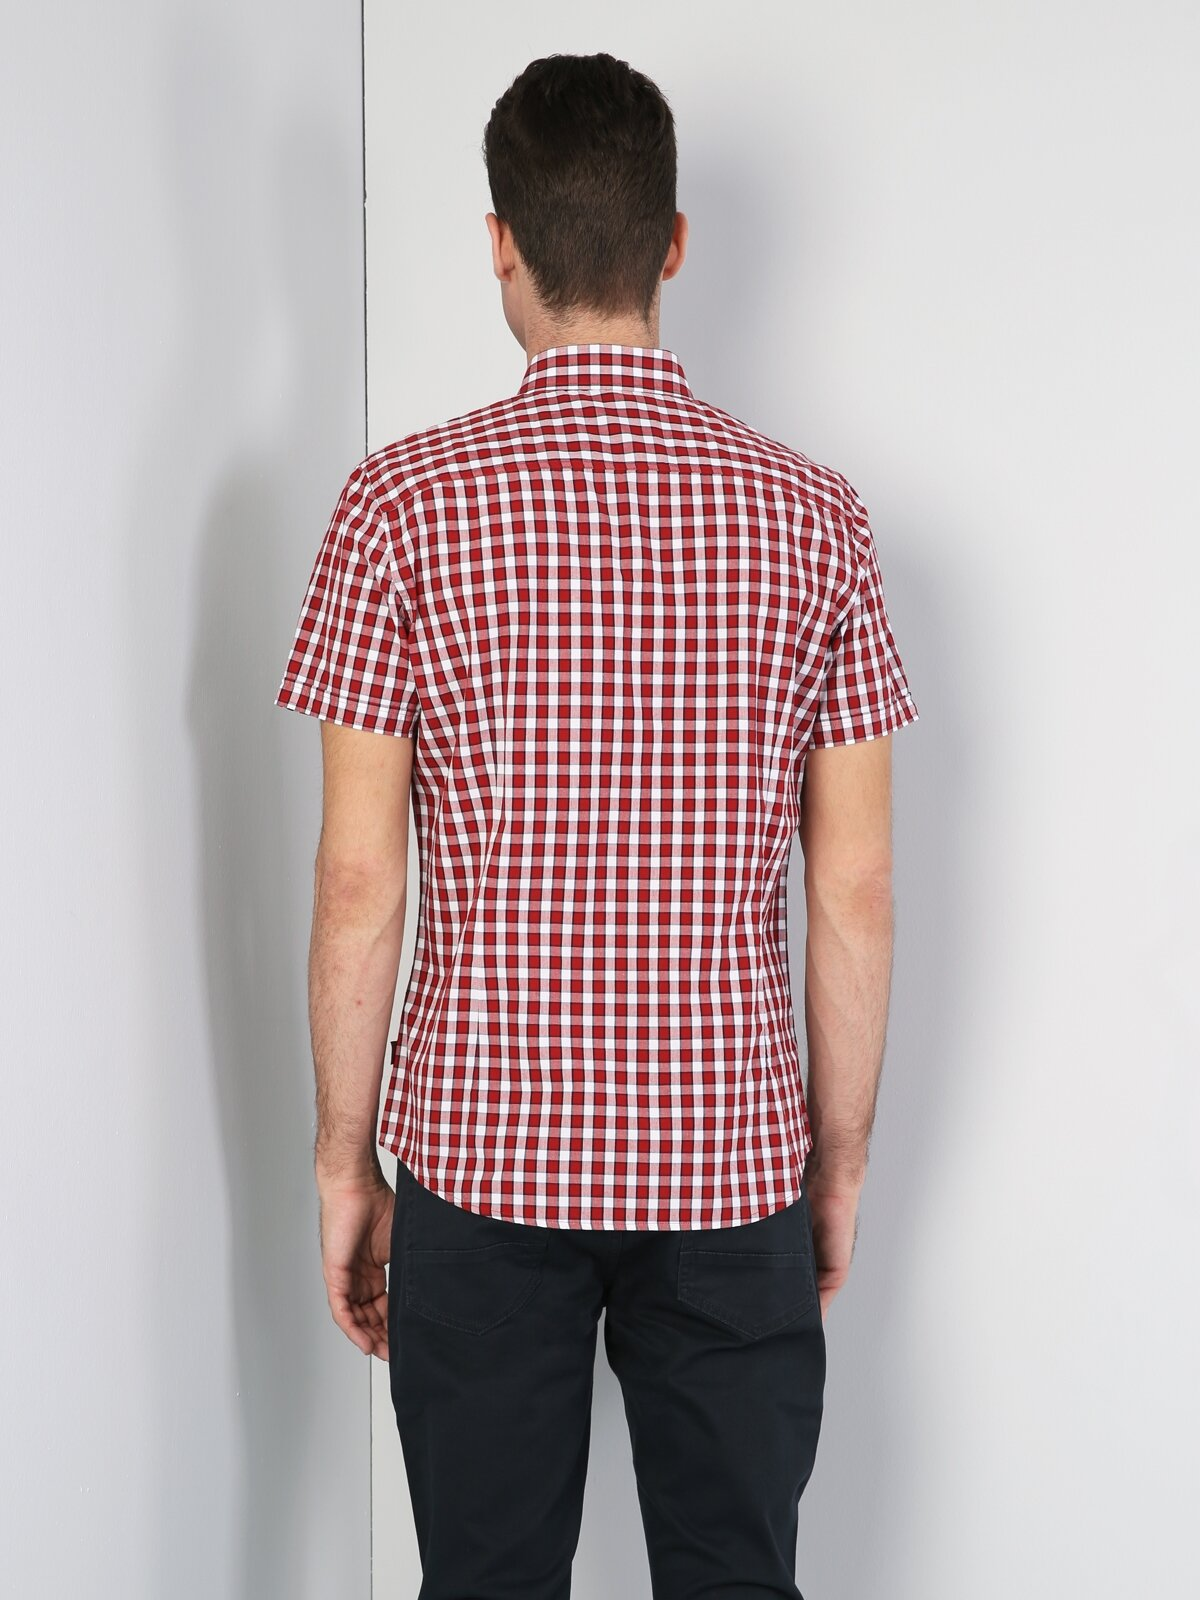 Slim Fit   Kırmızı Kısa Kol Gömlek